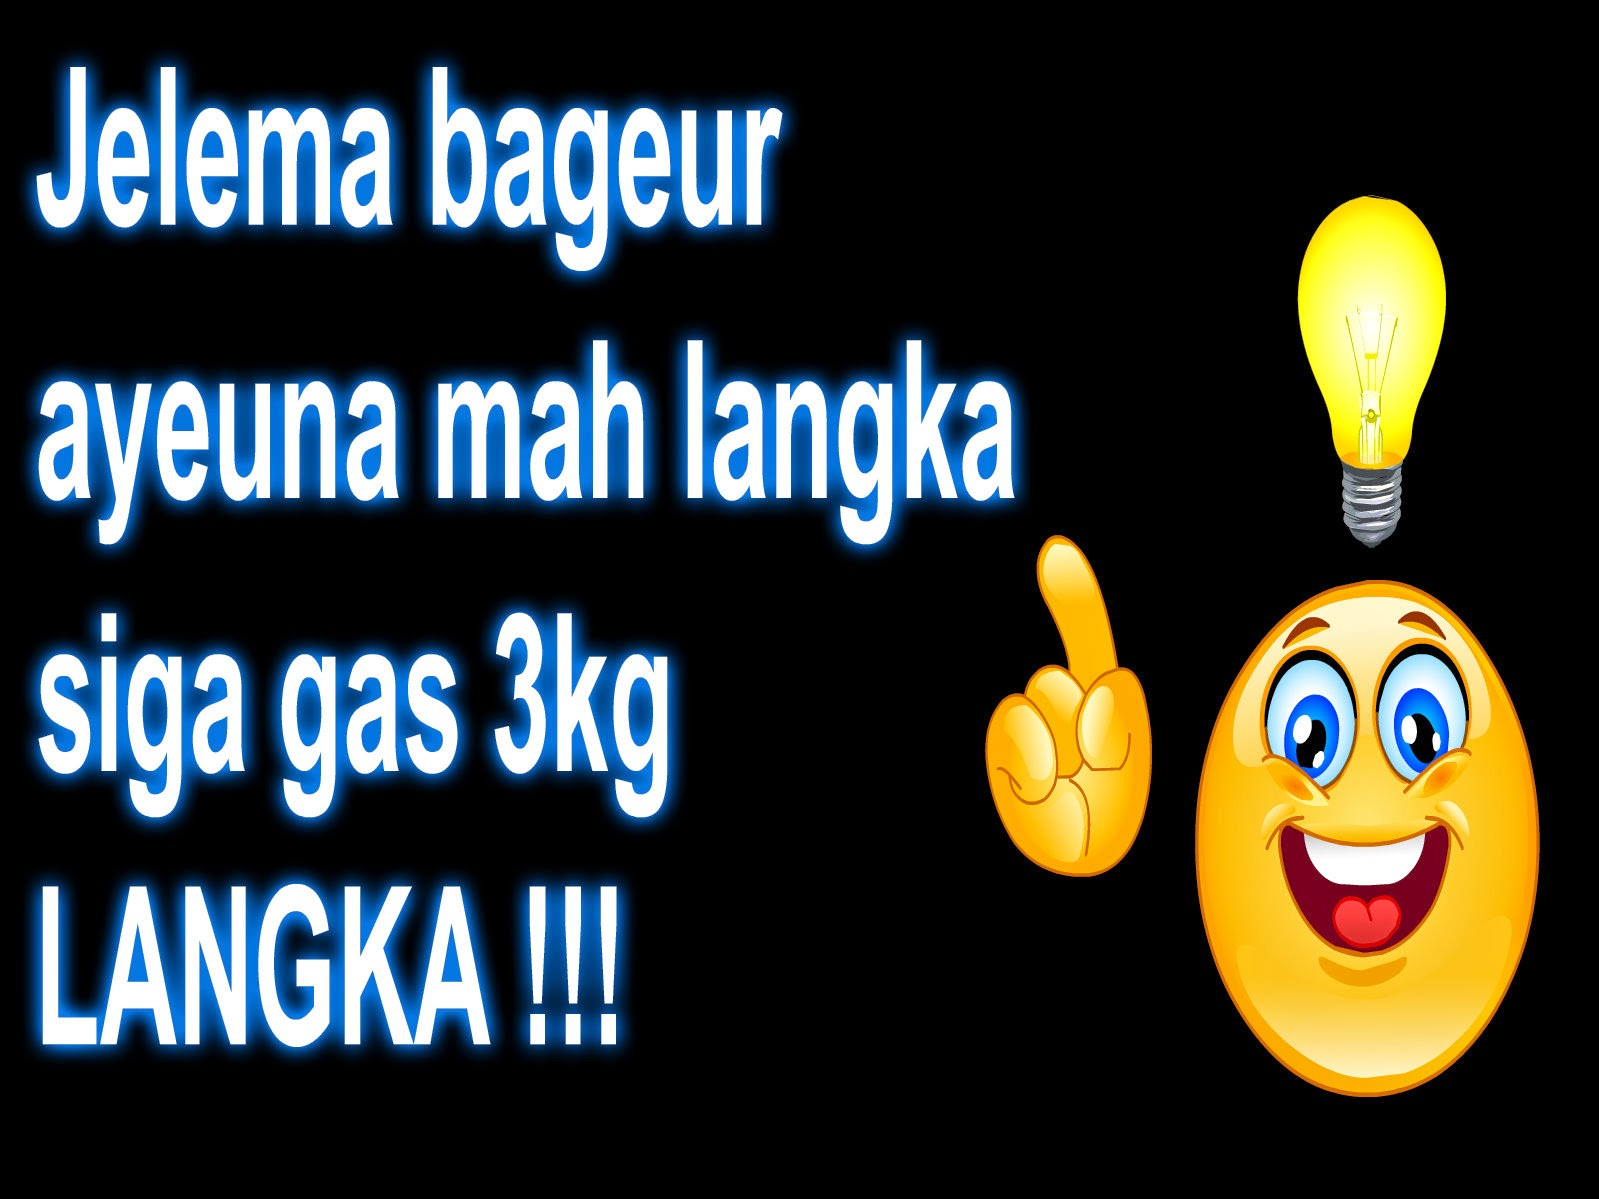 Gambar Kata Kata Bahasa Sunda Lucu Banget Qchil